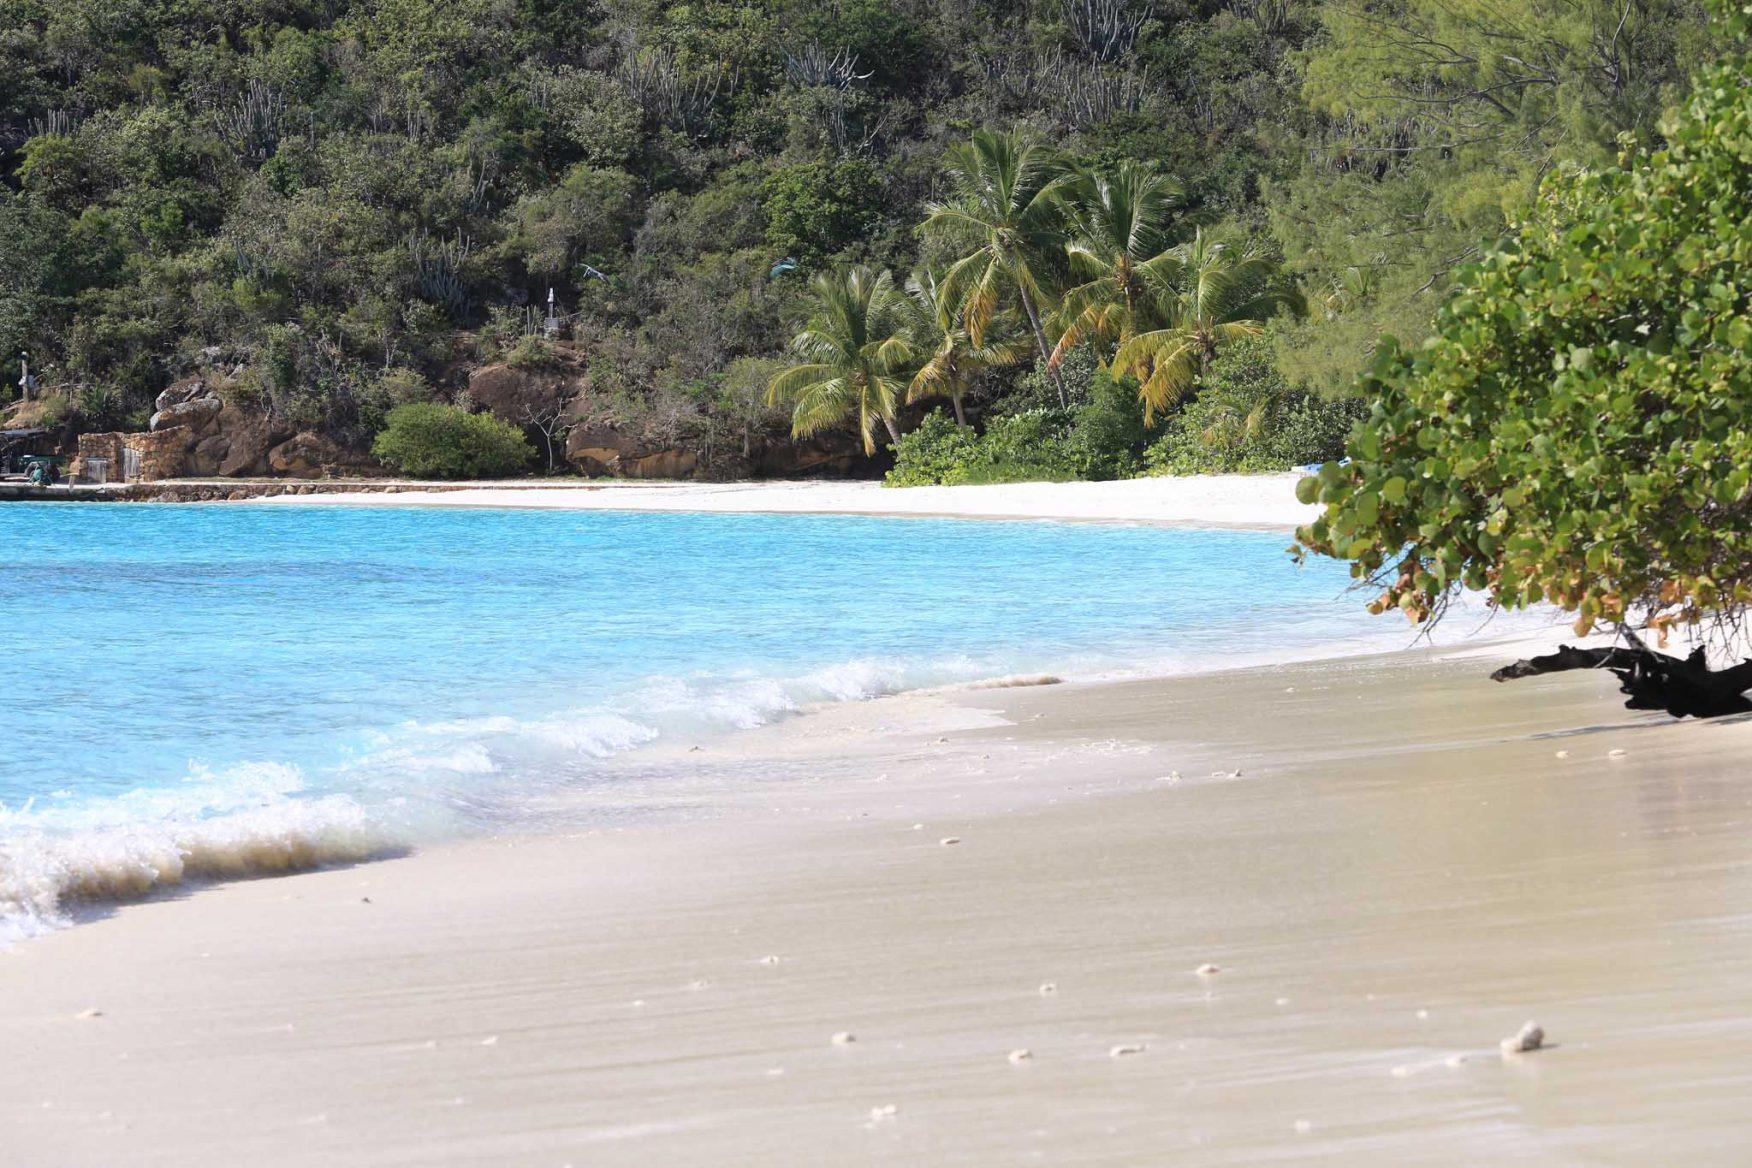 caribbean-cruising-pirate-quest-2